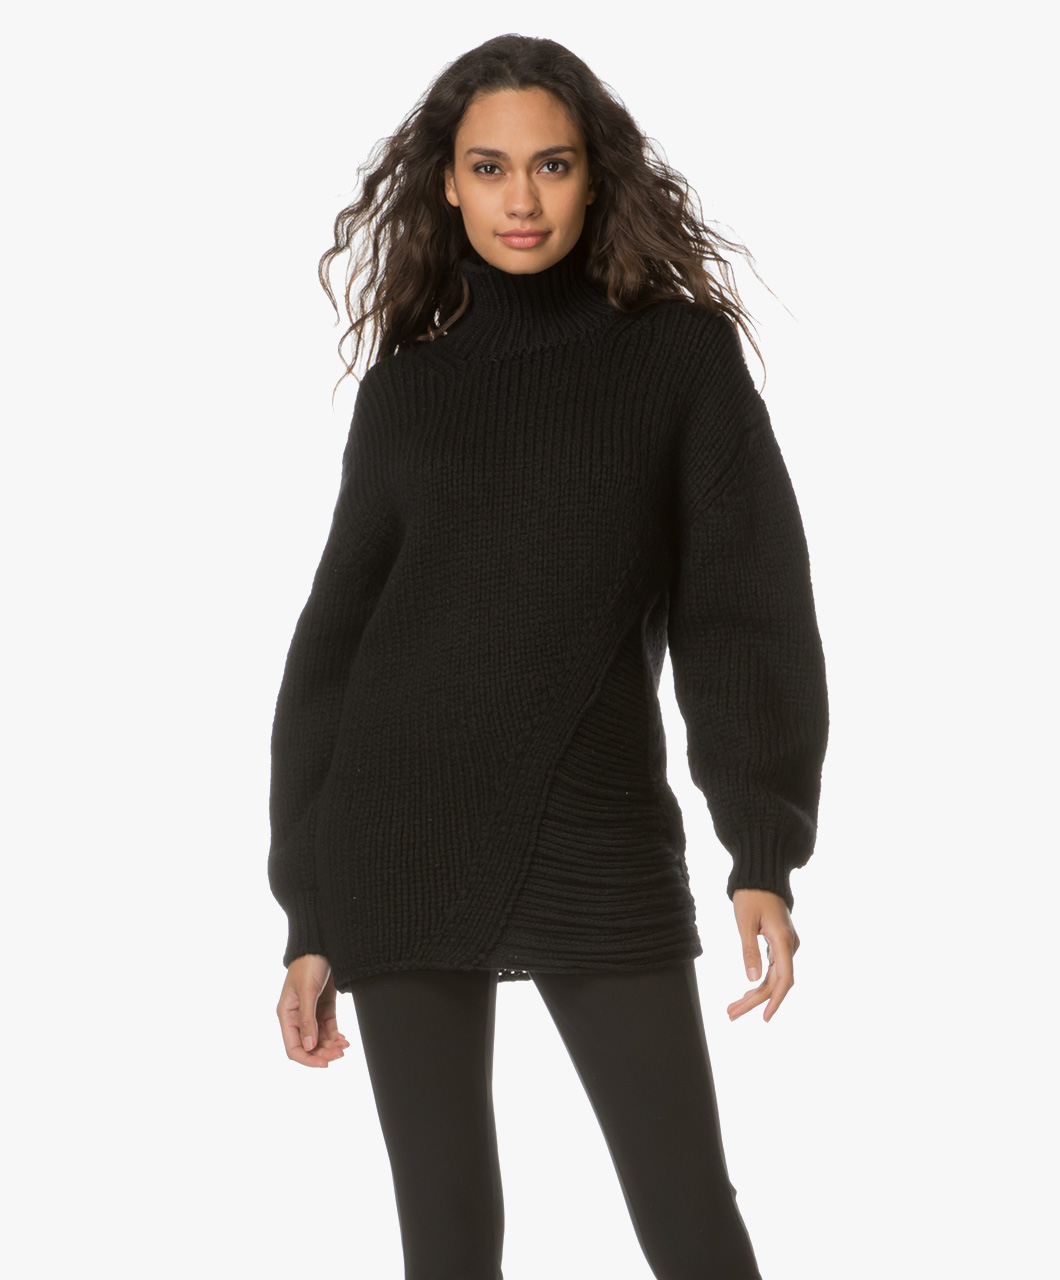 Grof Gebreide Zwarte Trui.Shop The Look Trendy Comfort Perfectly Basics